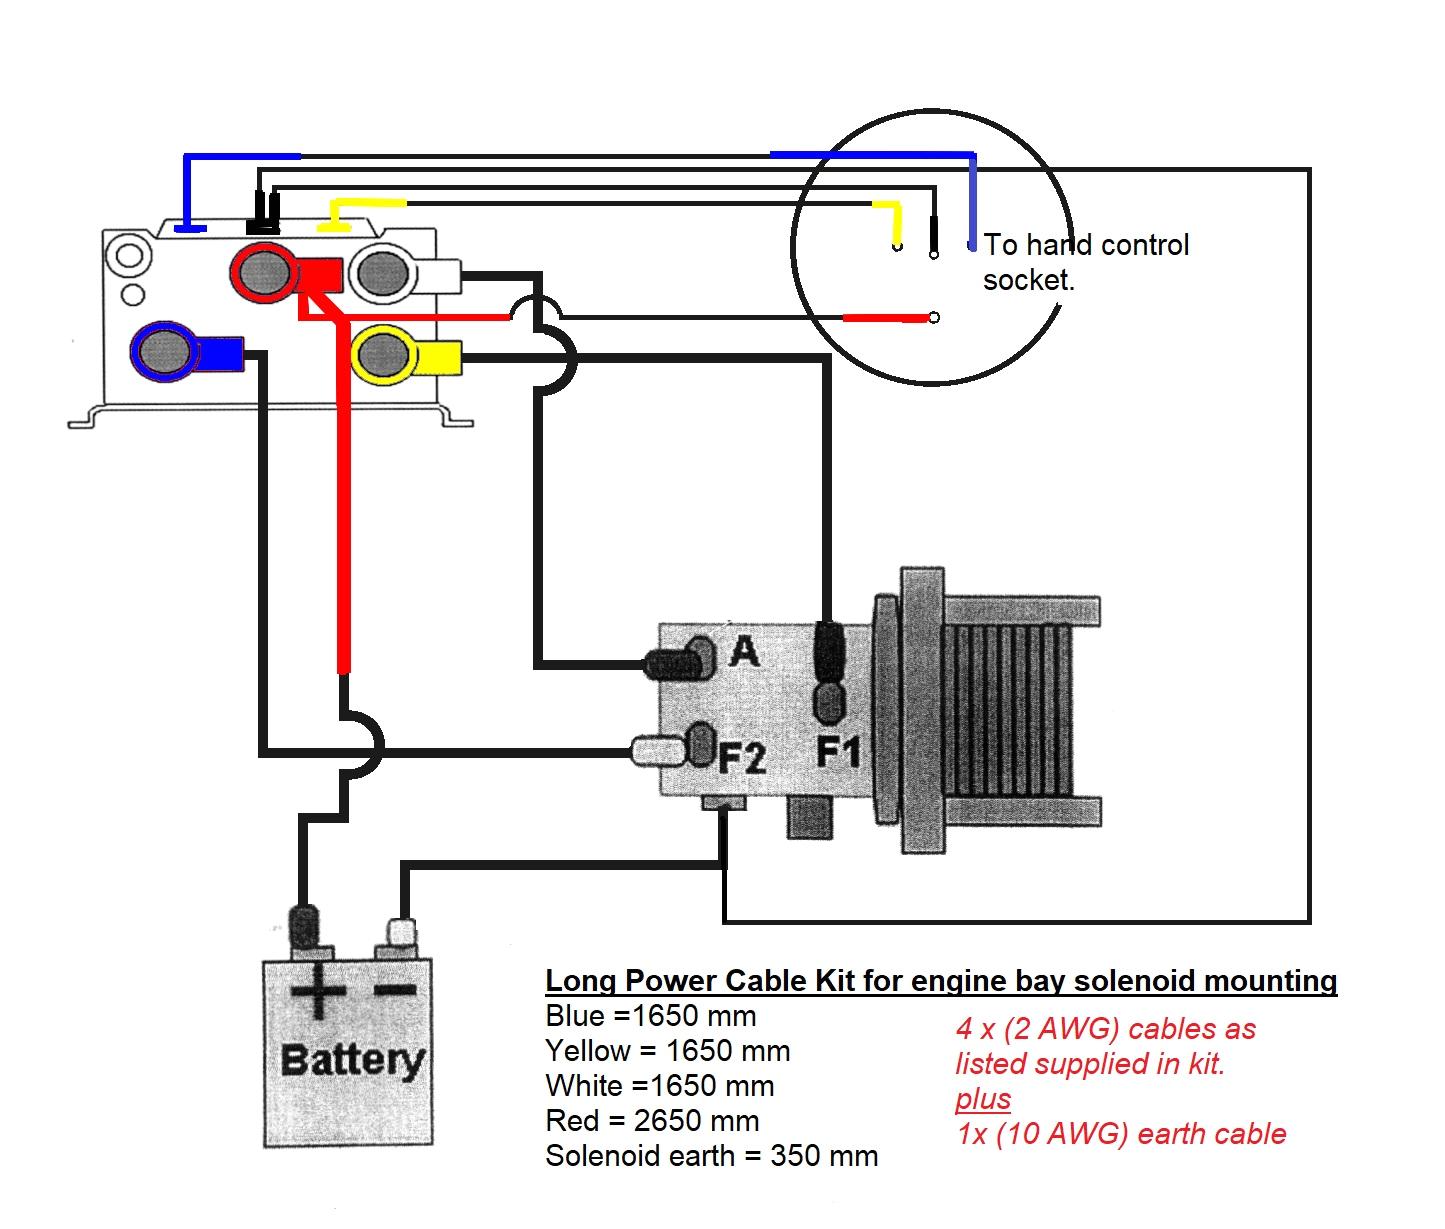 DIAGRAM] 3 Pole Winch Wiring Diagram FULL Version HD Quality Wiring Diagram  - ADROITWIRING.MANDIGOTTE.FR   Relay Pr380 Schematic Wiring Diagram      mandigotte.fr